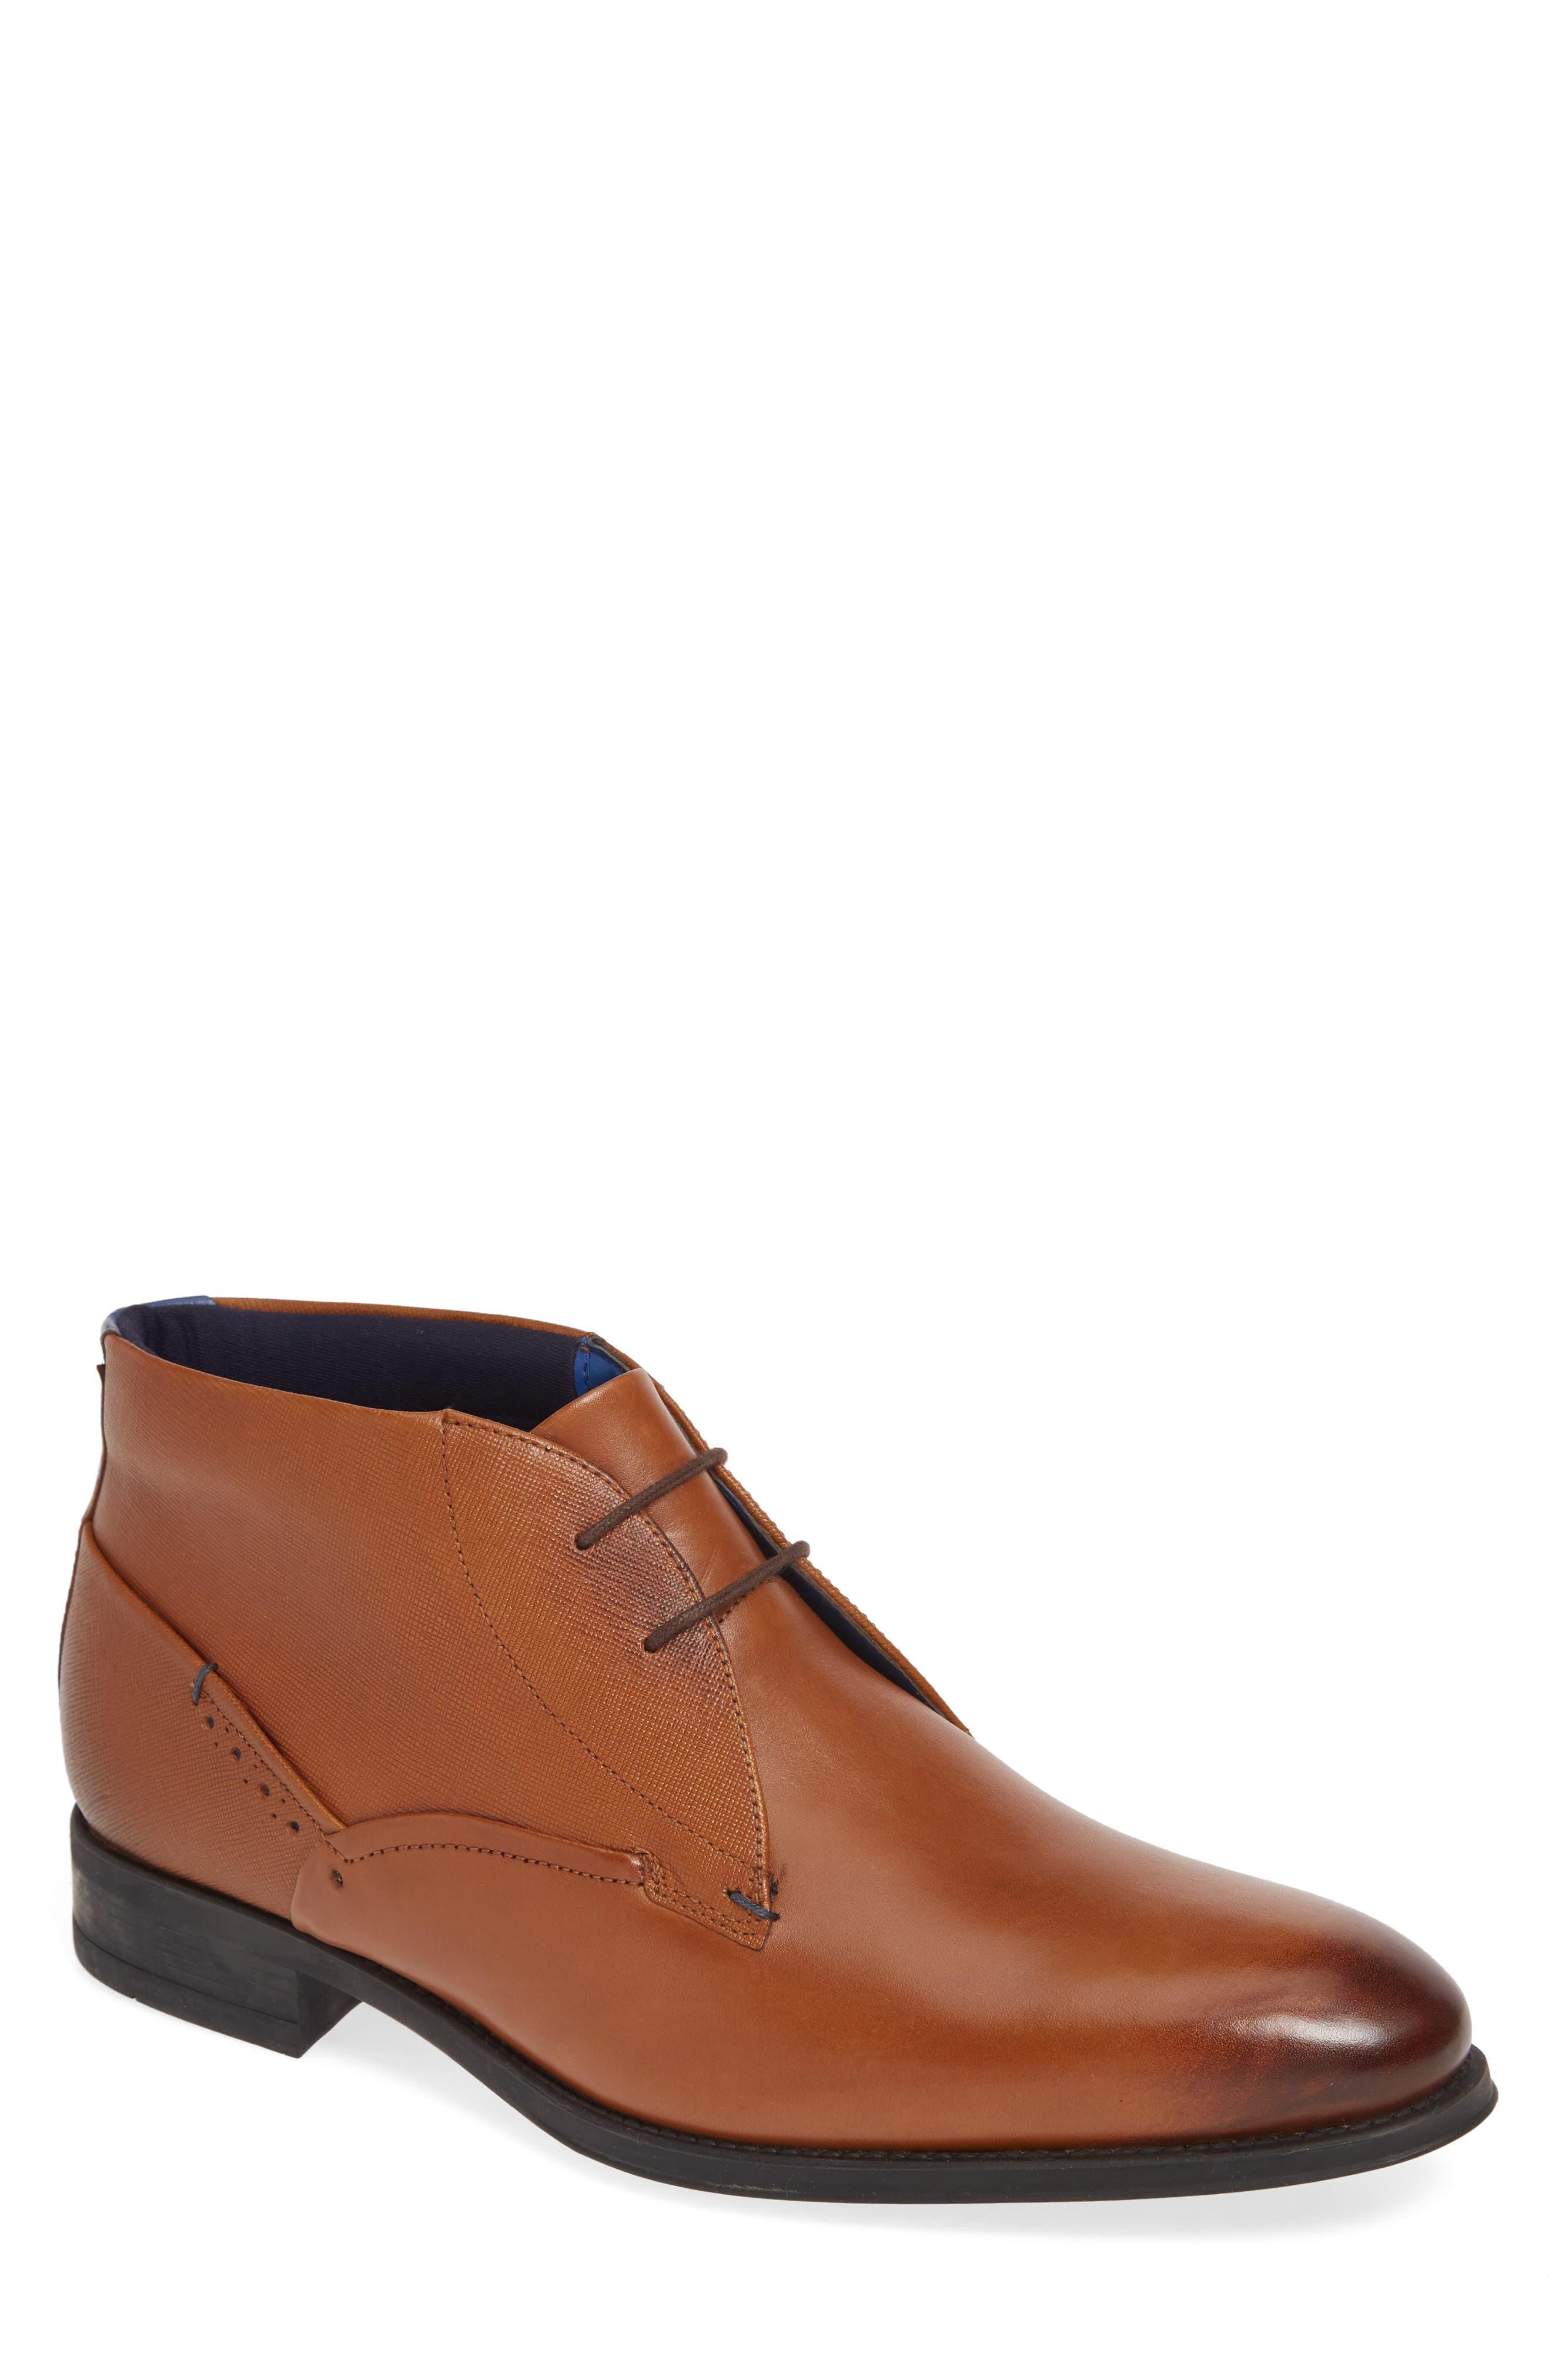 Ted Baker London Chemna Chukka Boot- Brown